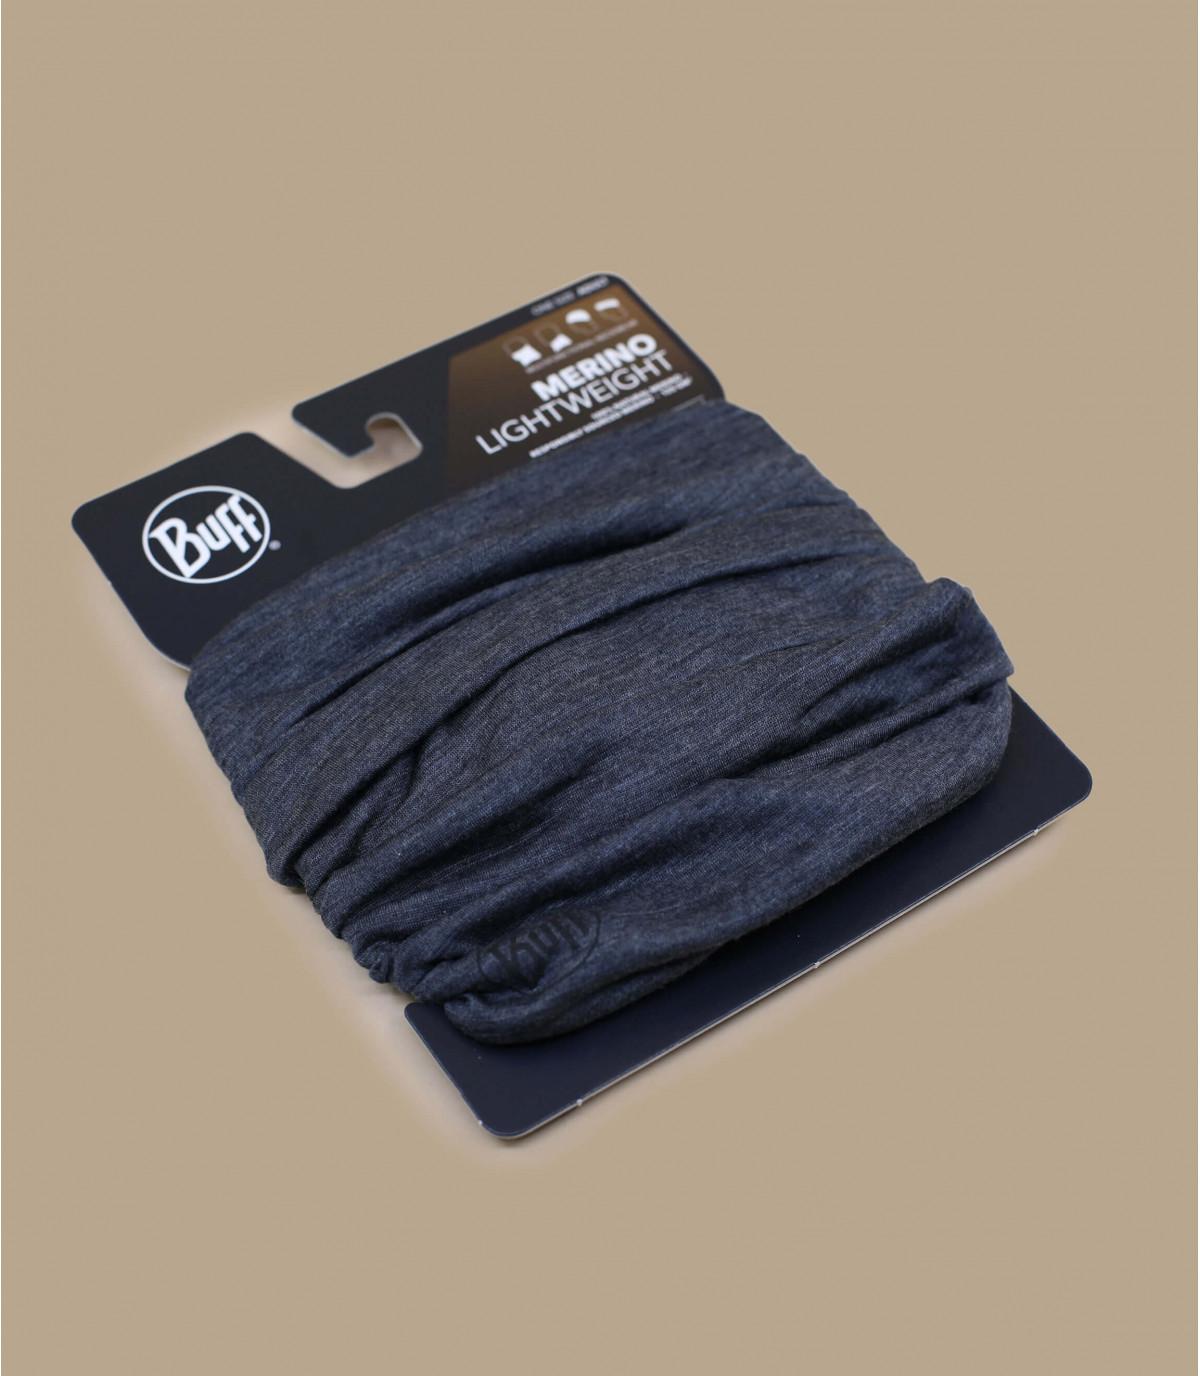 Details Lightweight Merino Wool solid grey - Abbildung 2